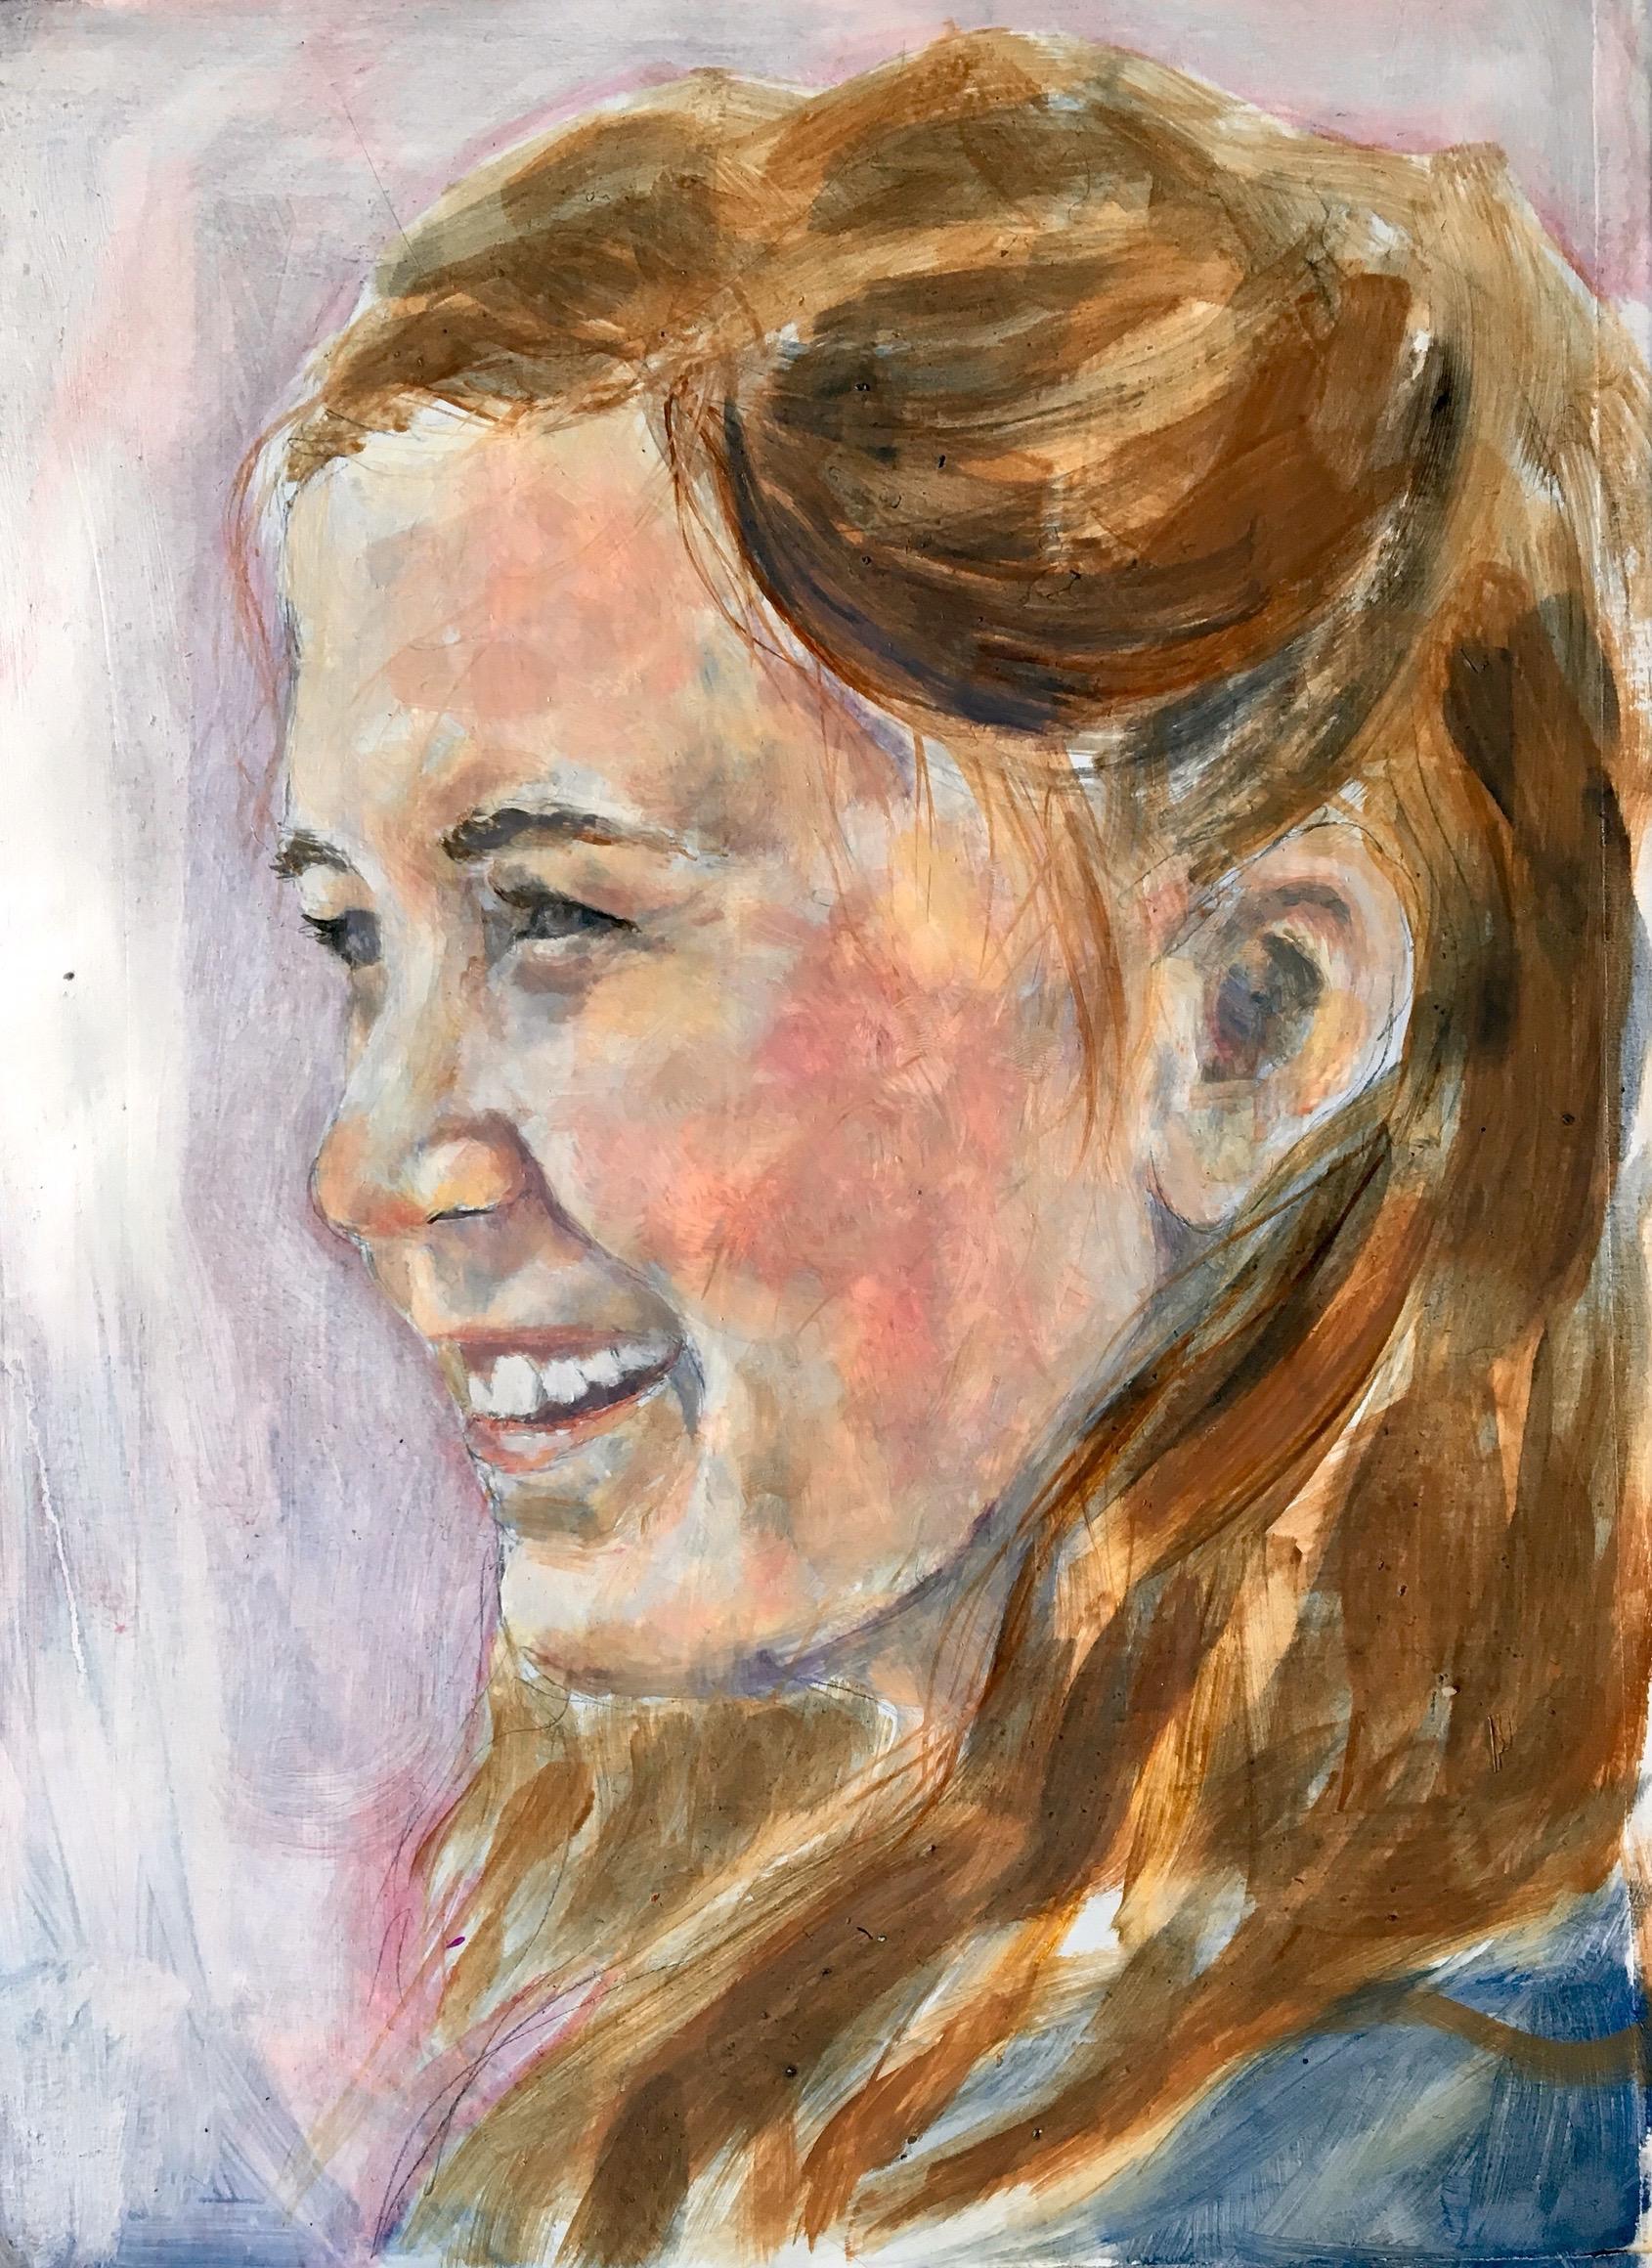 Sara Martin,Oil on Paper, 2016